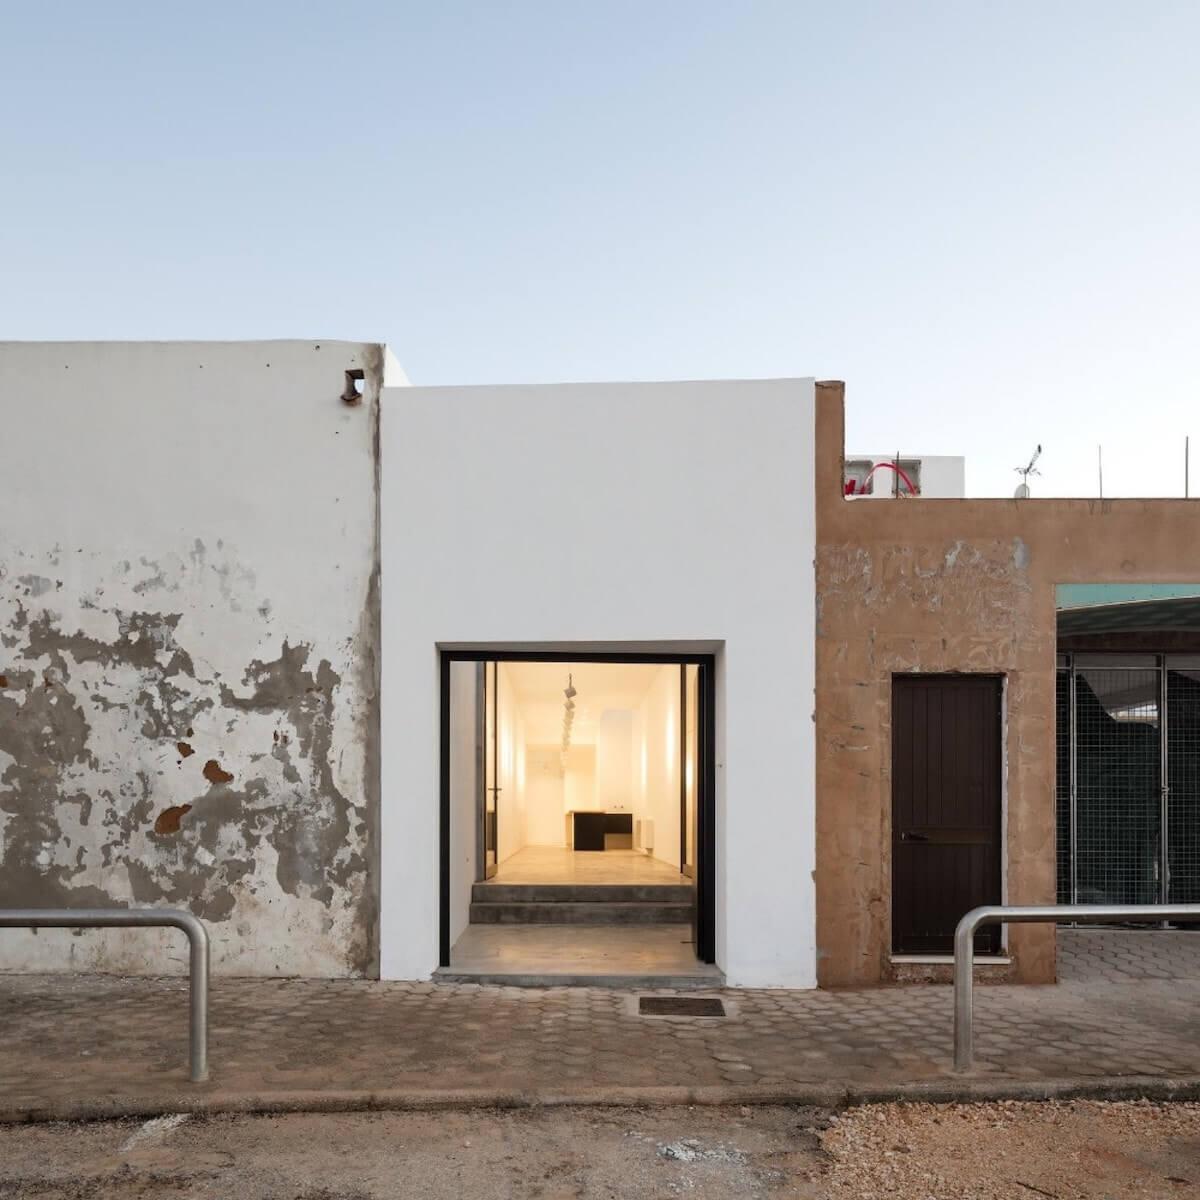 Arquitetura: Marlene Uldschmidt .  Projeto: Galeria Vasco Da Gama 26 .  Fotografia: ©Fernando Guerra | FG+SG